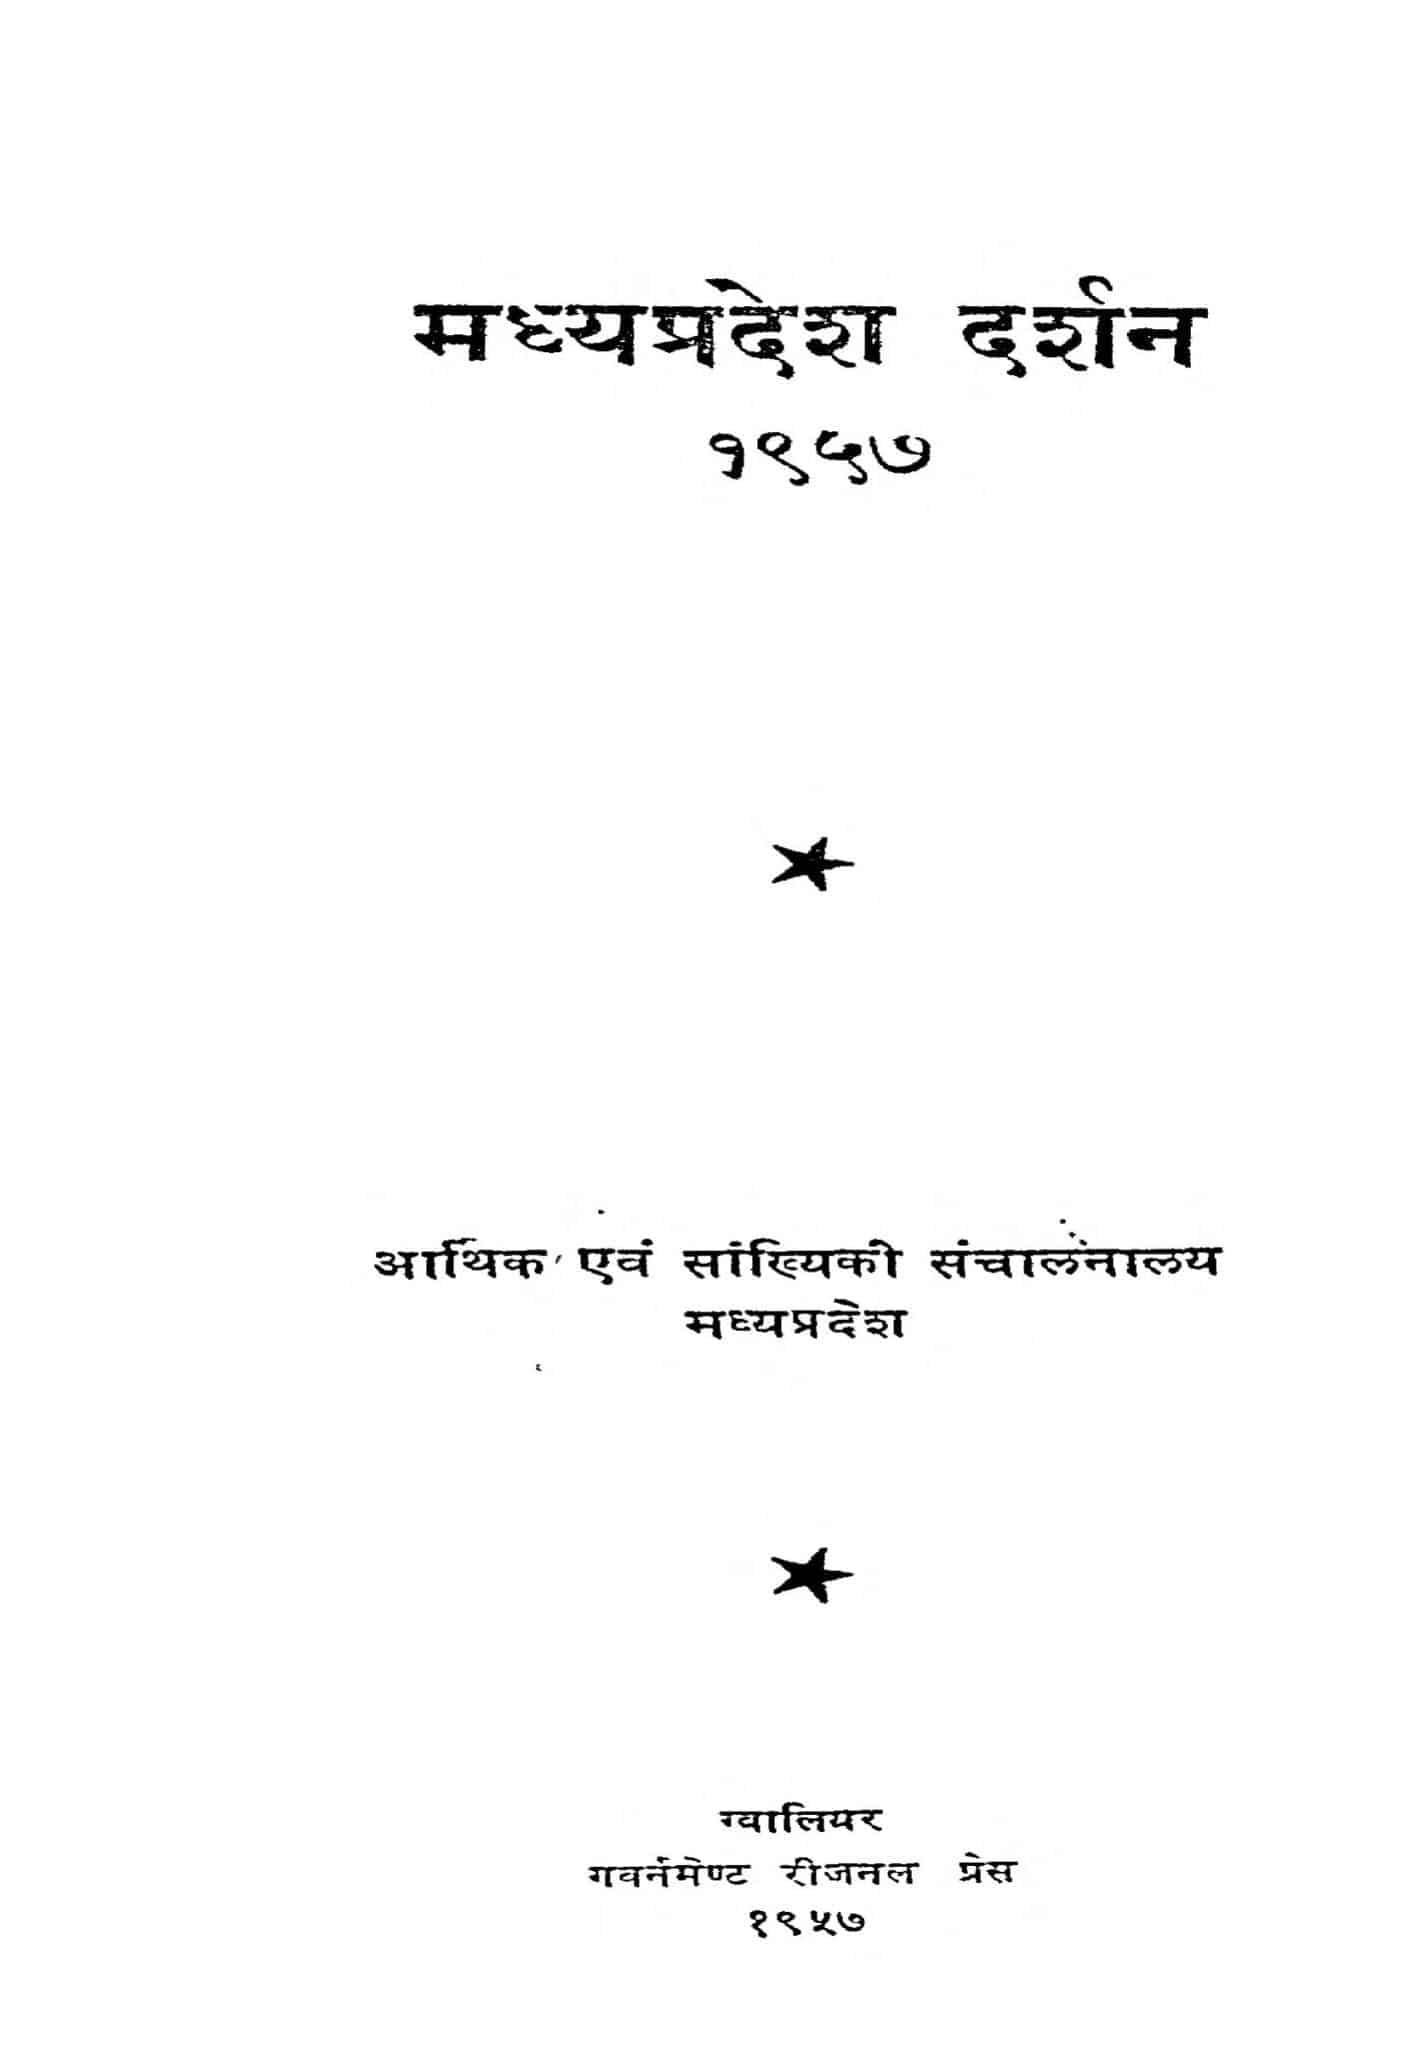 Madhya Pradesh Darshan 1957 by मा. म. मेहता - Ma. M. Mehata